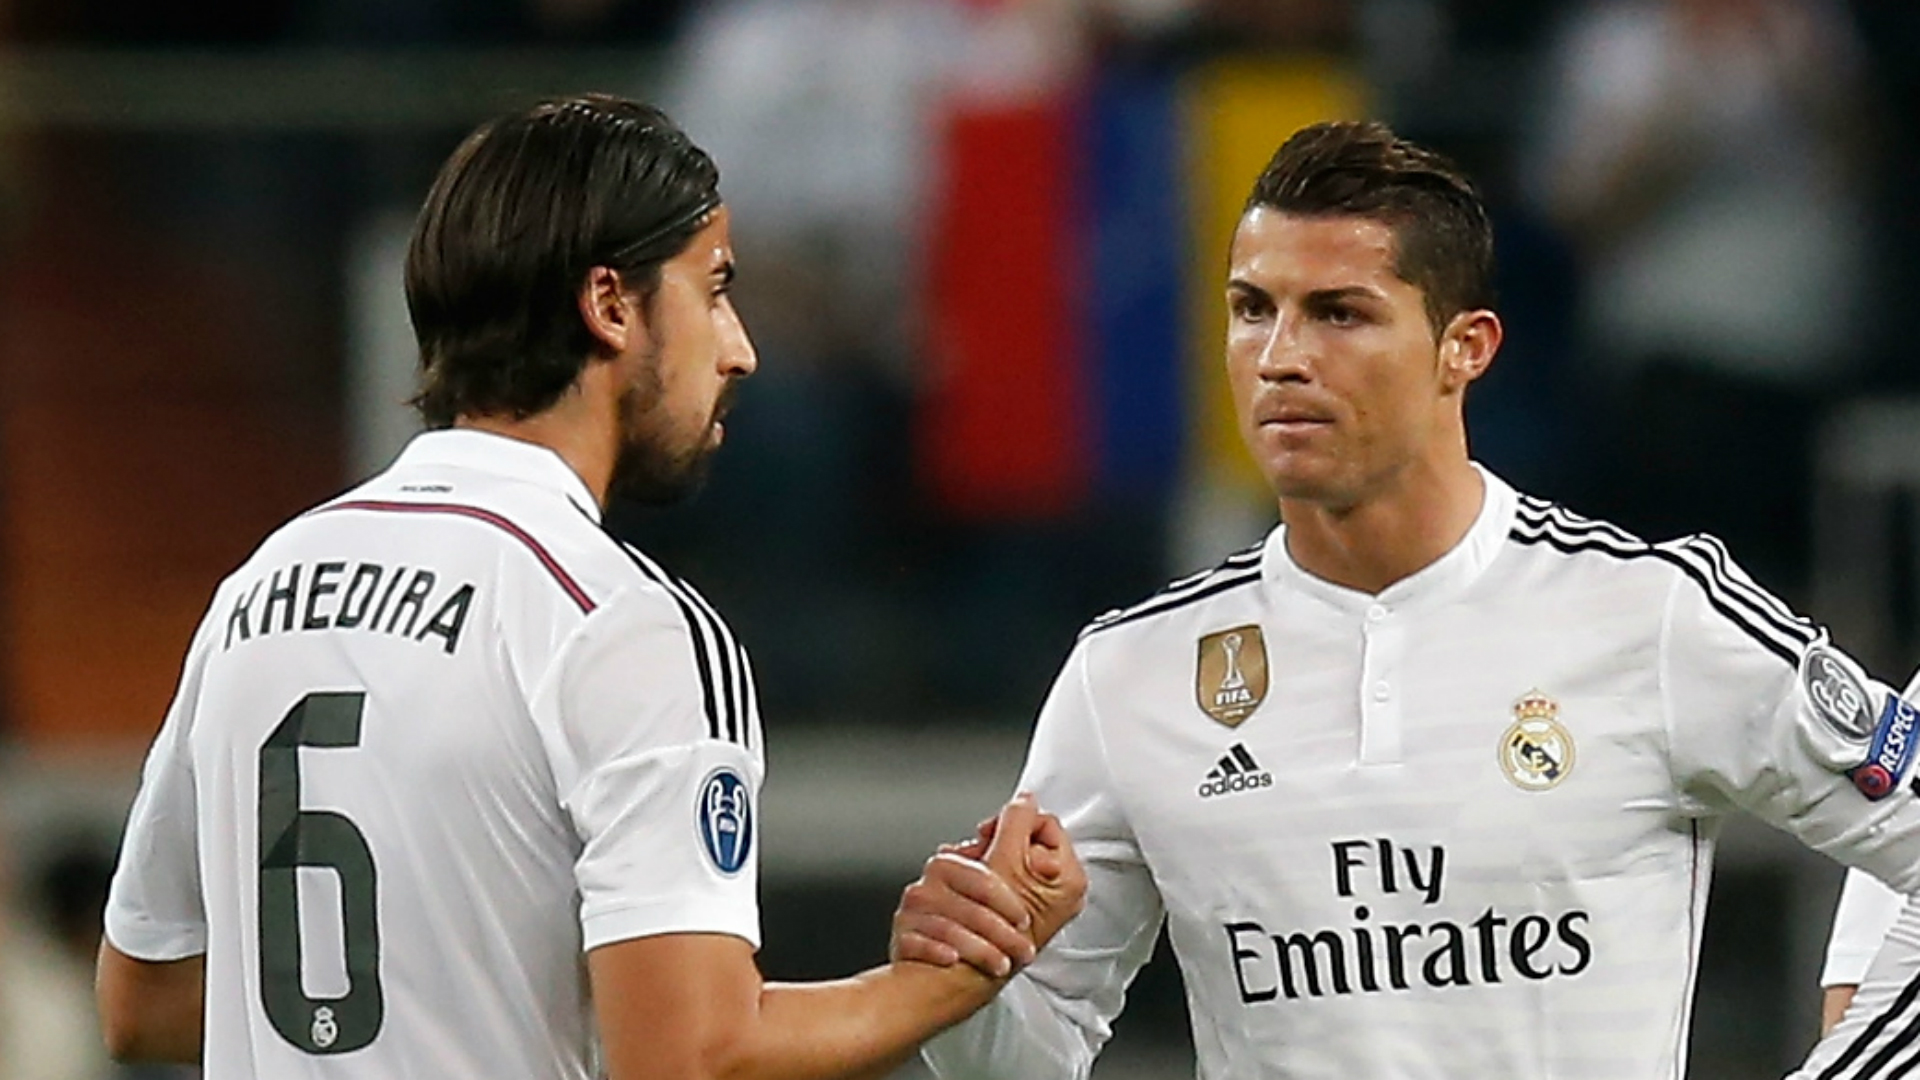 Ronaldo to Juventus: Khedira welcomes former Real Madrid team-mate